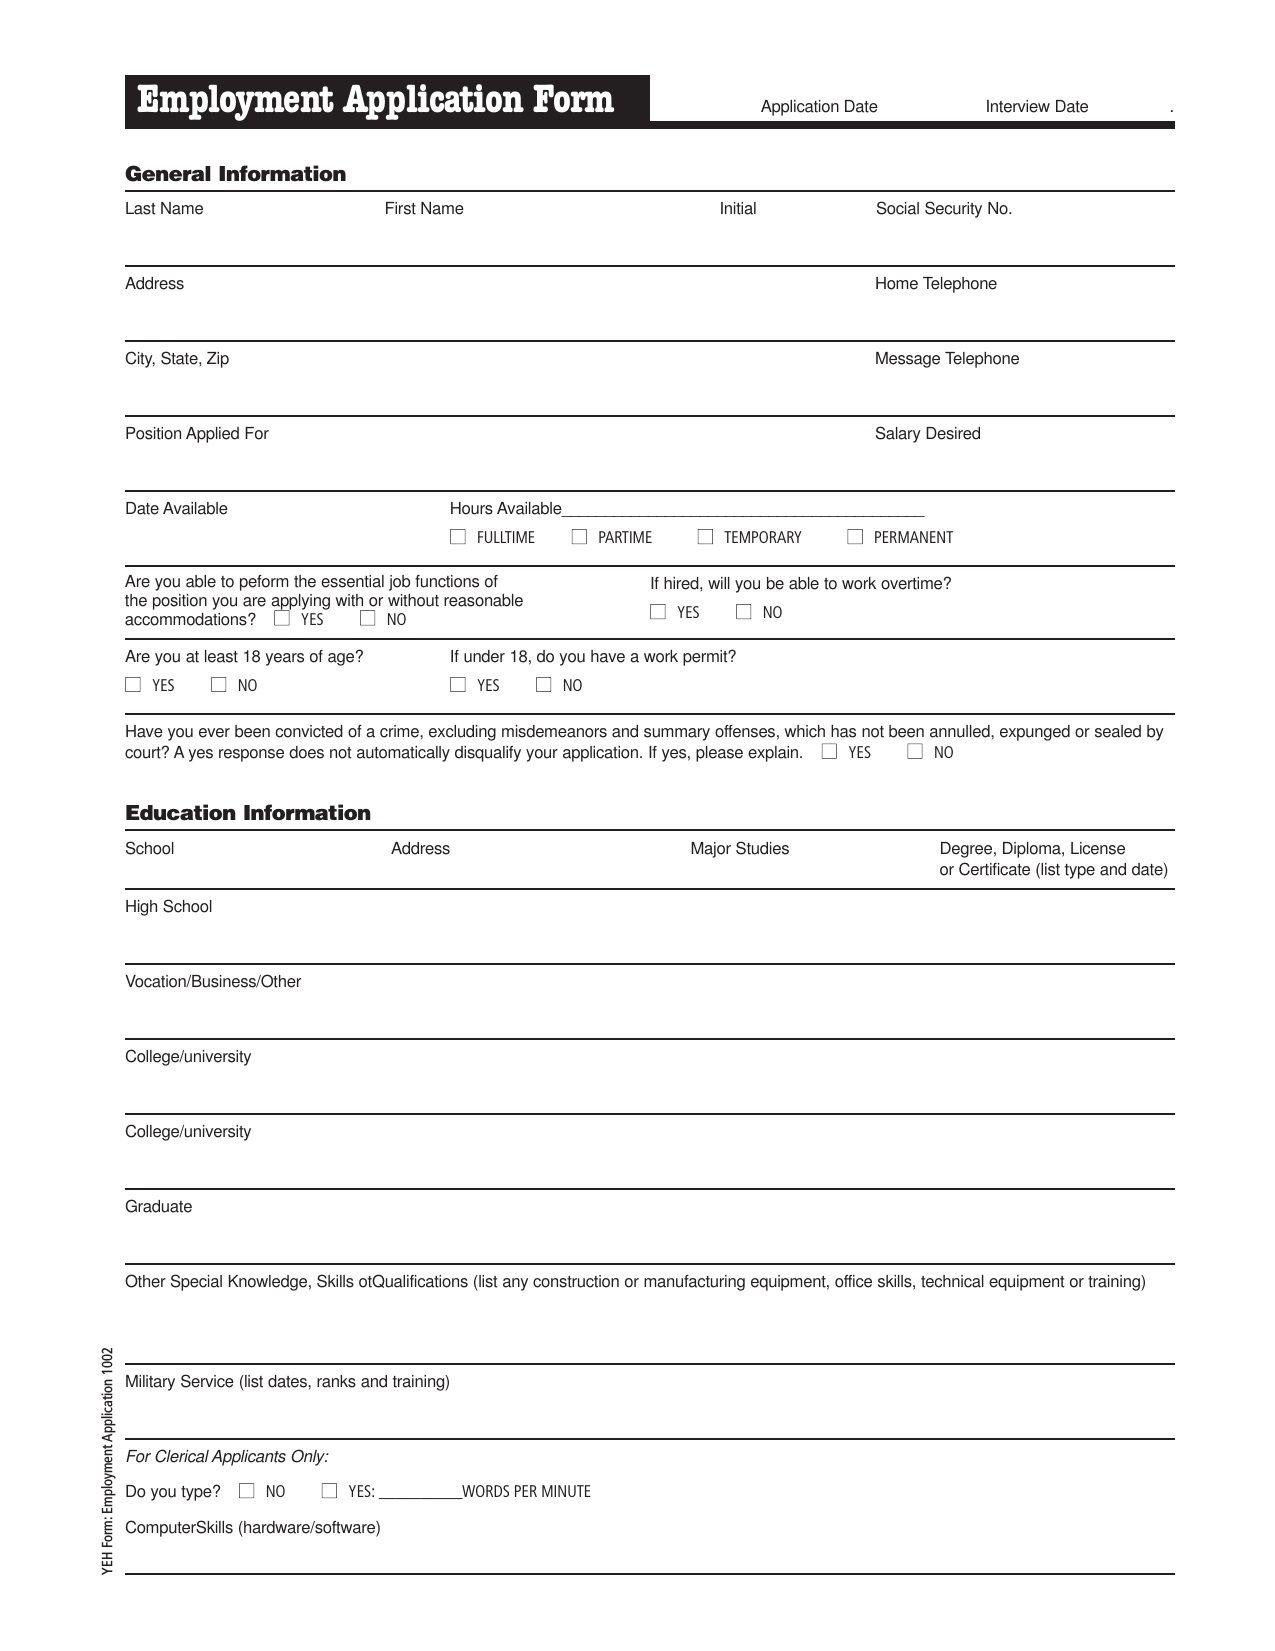 009 Excellent Job Application Template Pdf Design  Employment Form California Restaurant Sri LankaFull